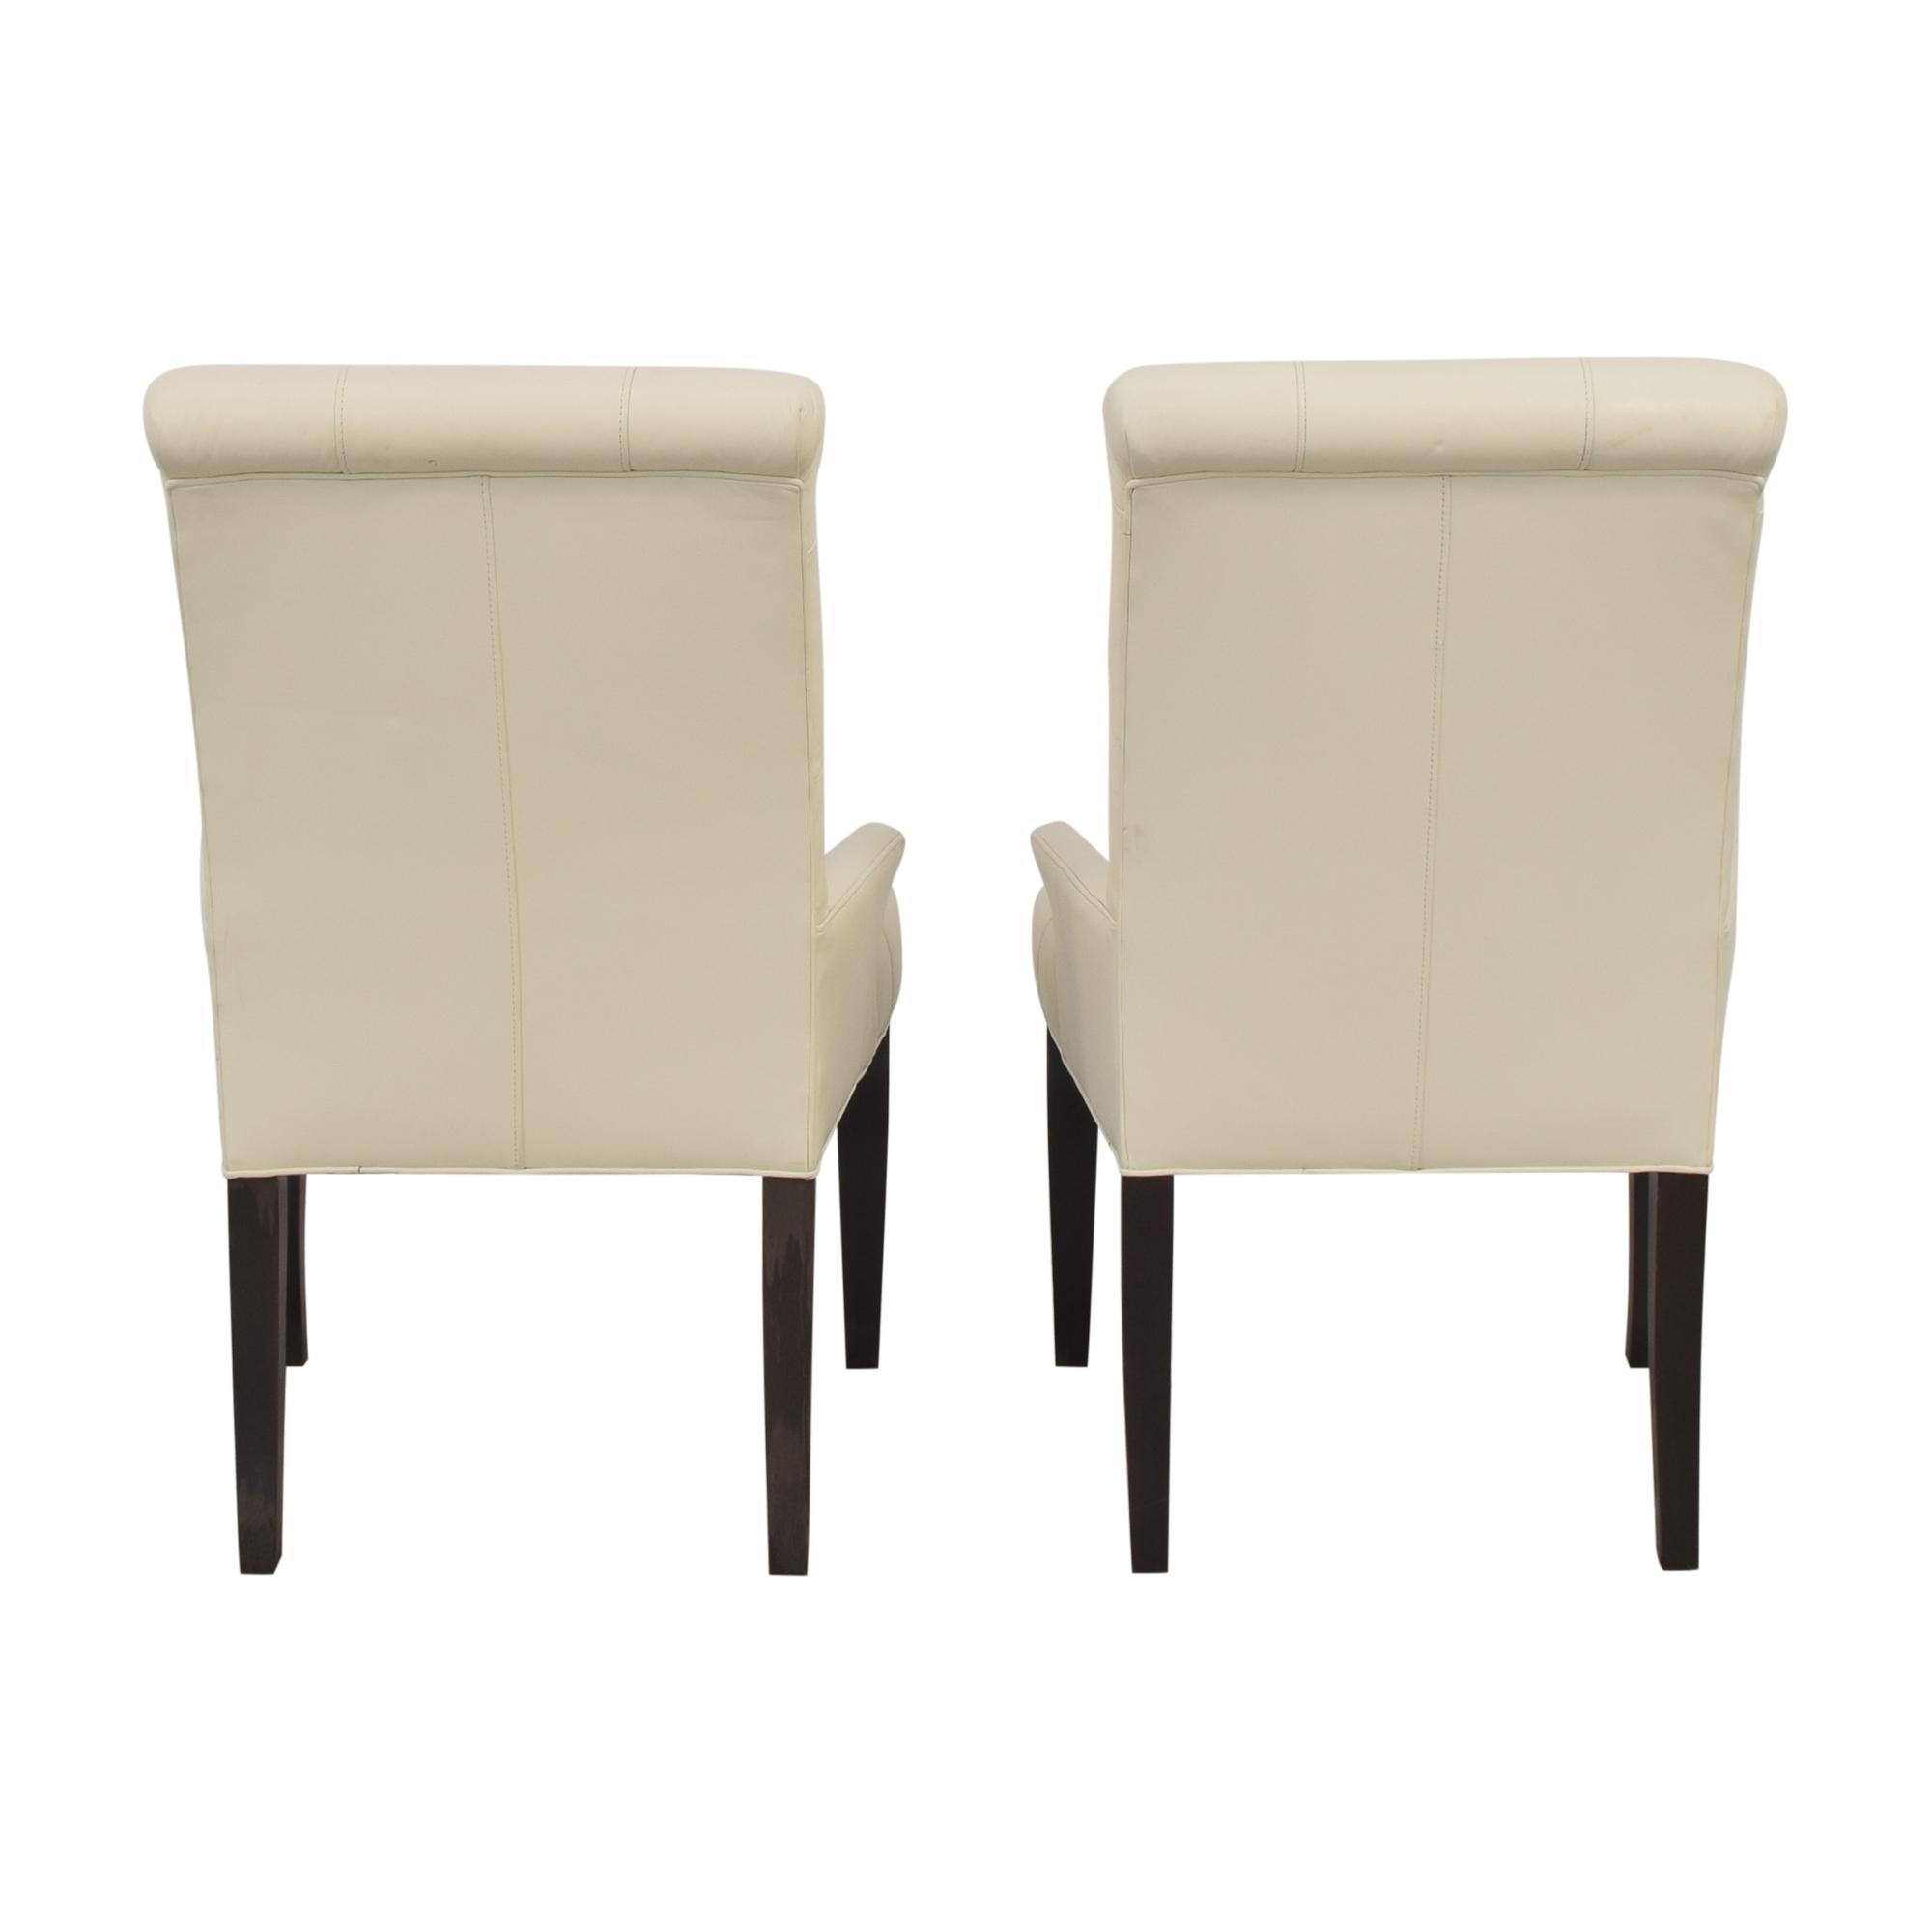 Ethan Allen Ethan Allen Verlaine Dining Armchairs Chairs